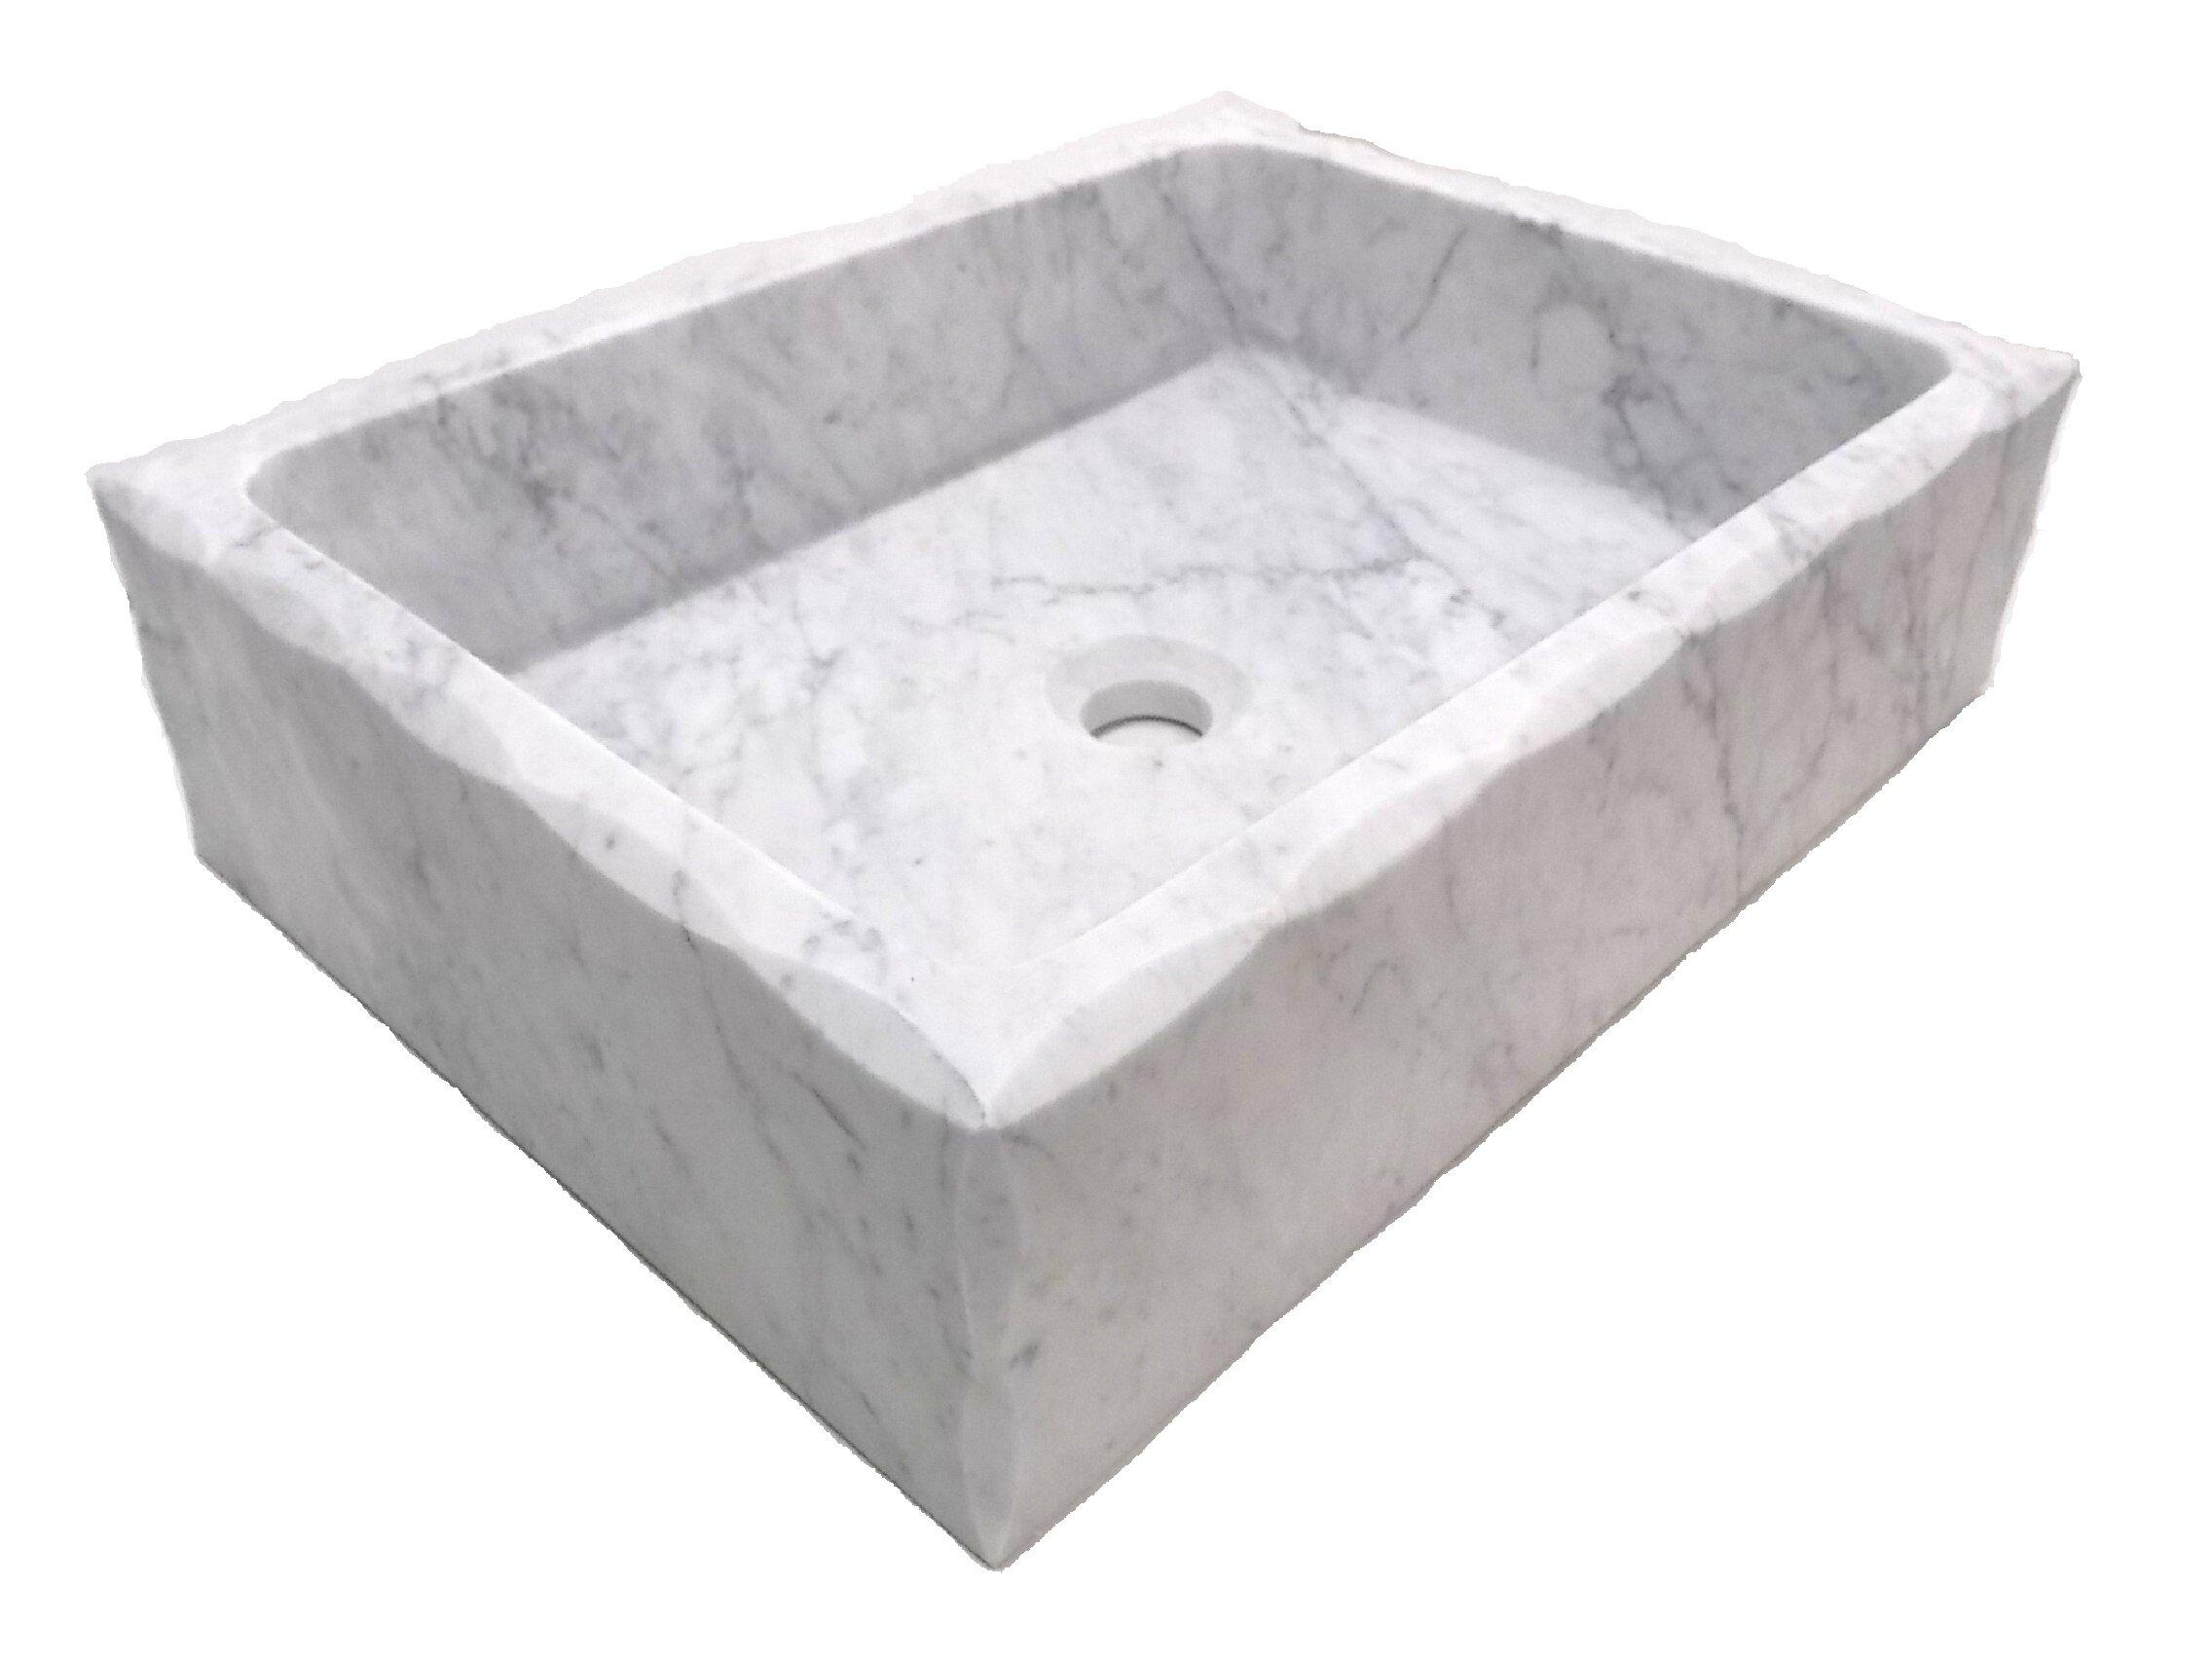 Edenbath Honed Antique Carrara Marble Rectangular Vessel Bathroom Sink Wayfair